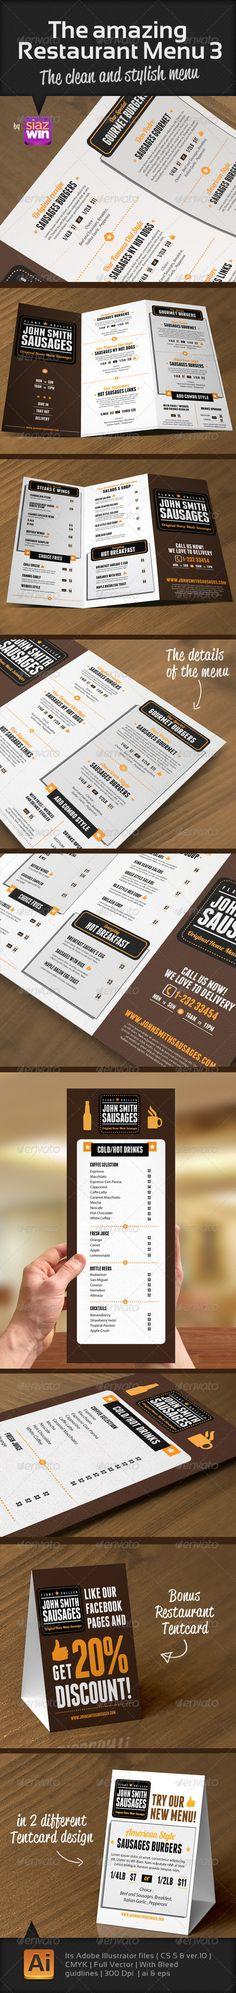 Print Templates - The Amazing Restaurant Menu 3 | GraphicRiver